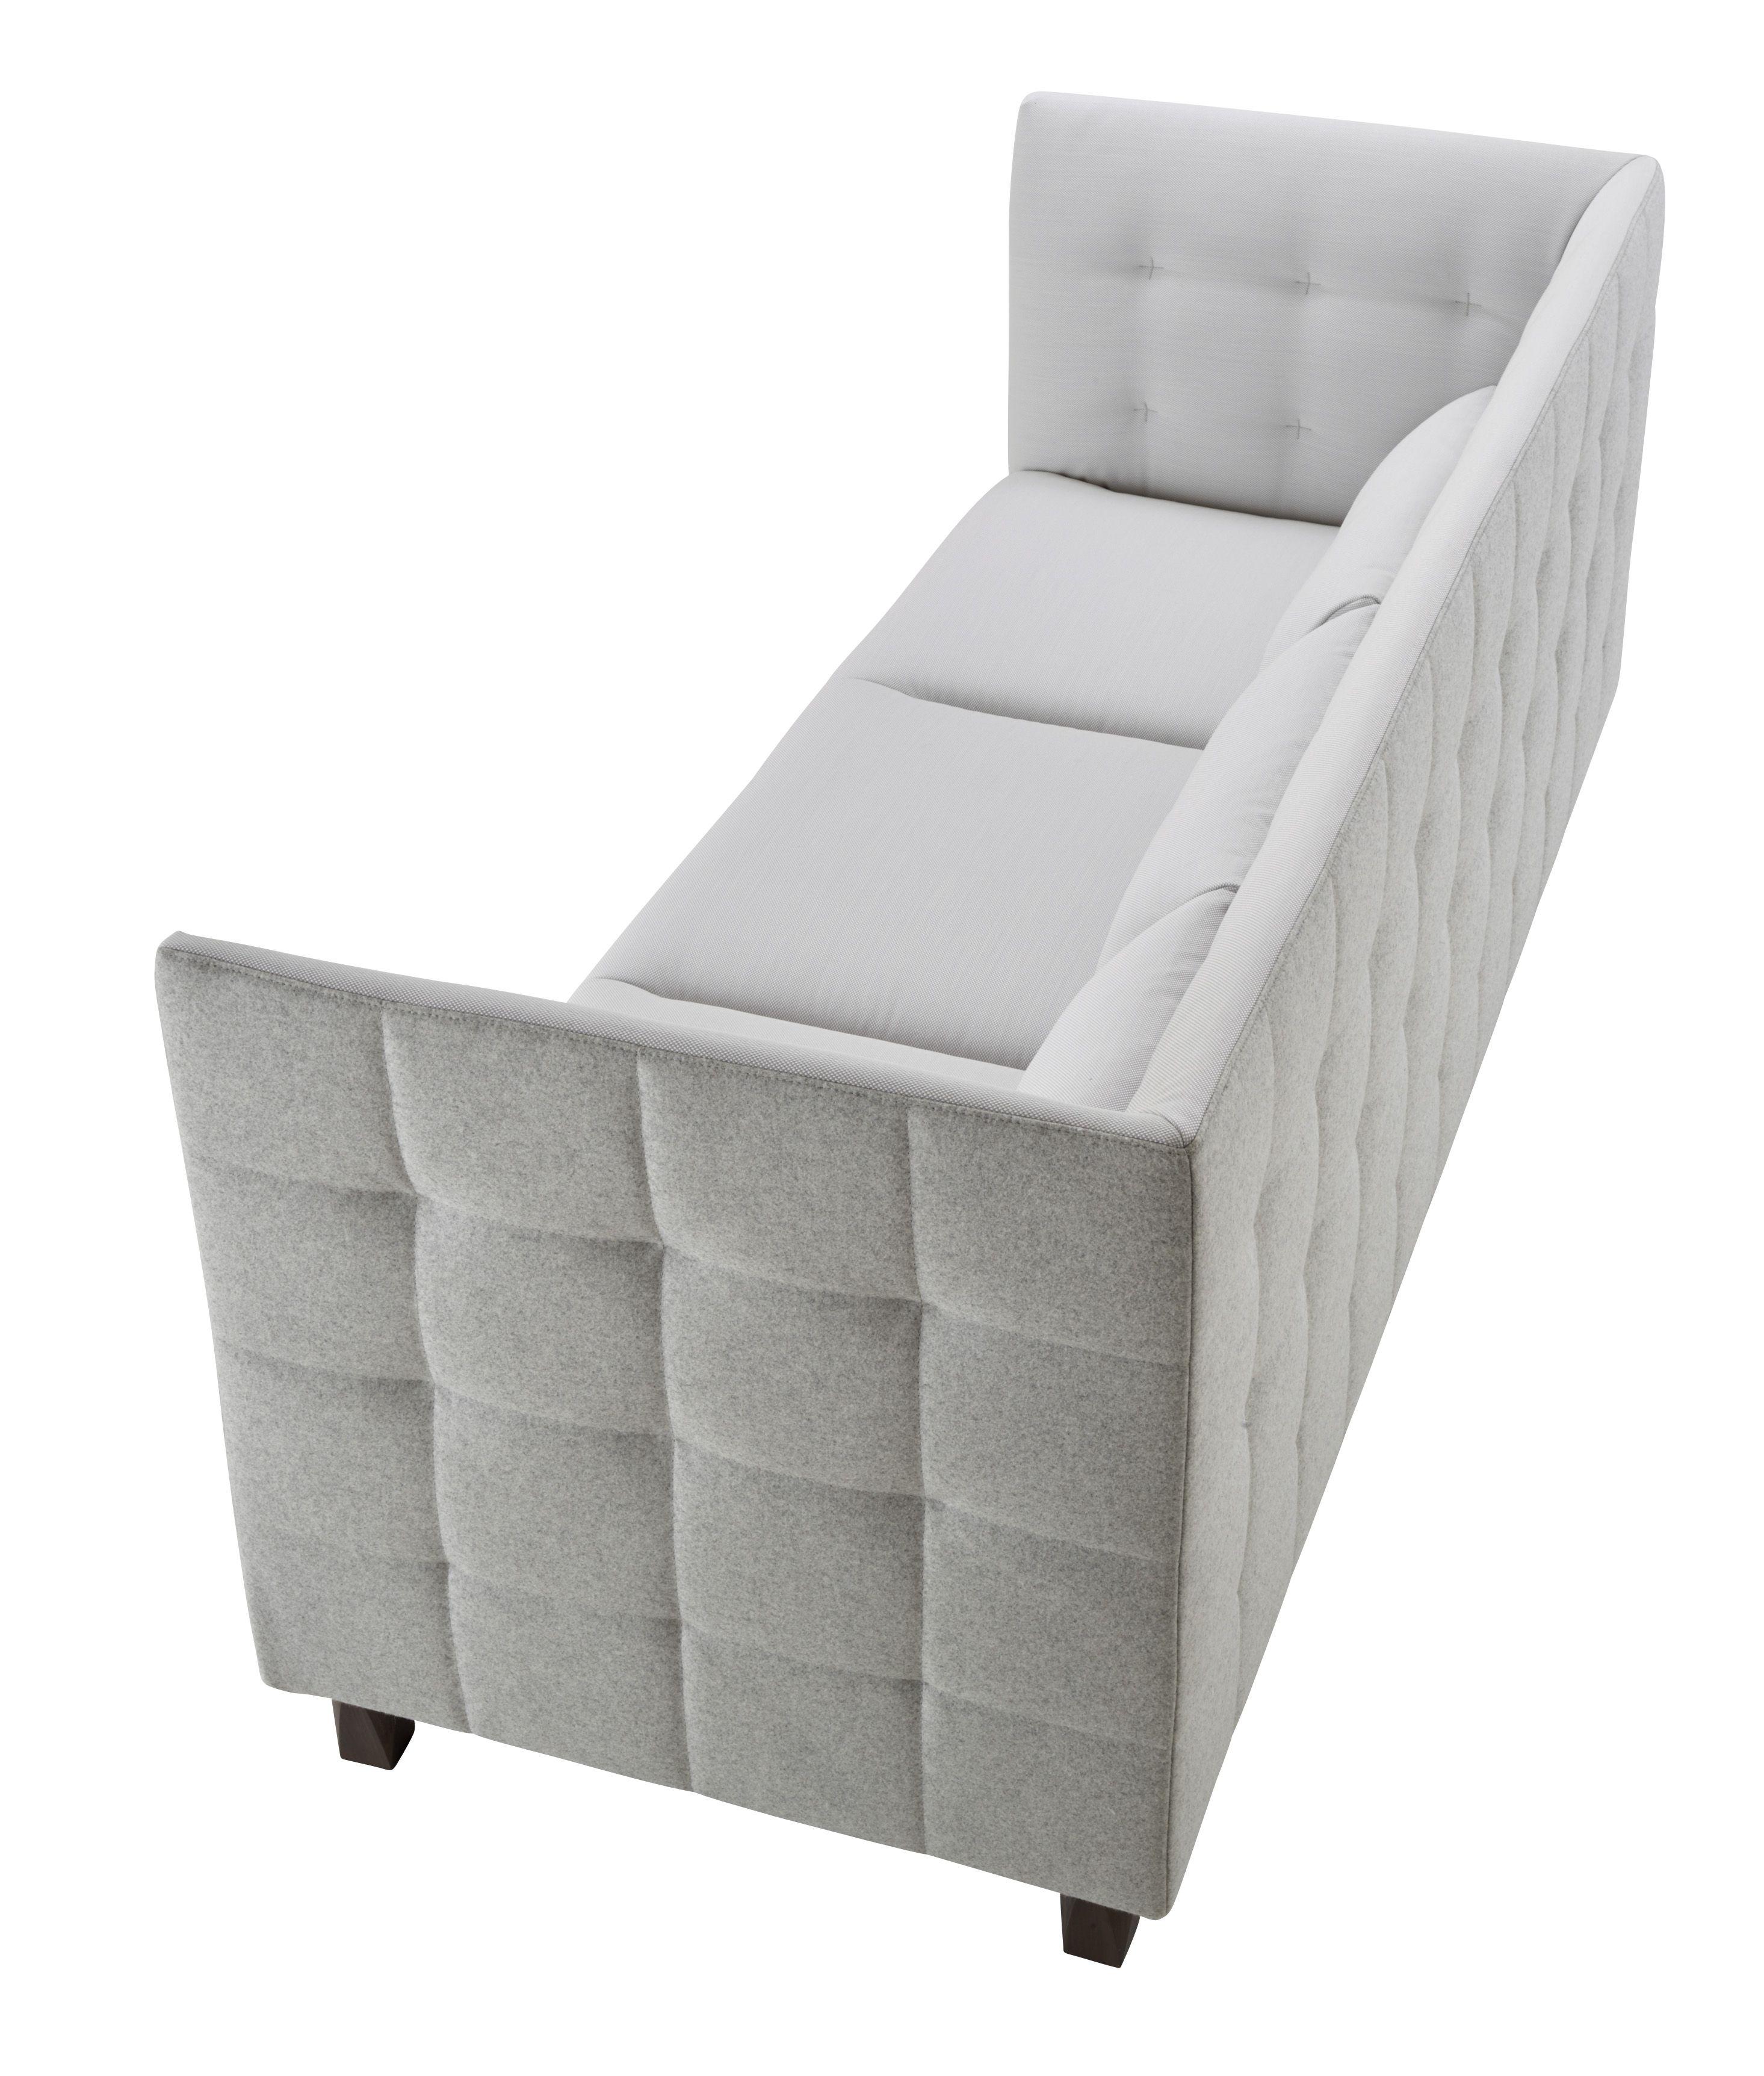 mcd 2015 3 seater sofa by roset italia design marie. Black Bedroom Furniture Sets. Home Design Ideas